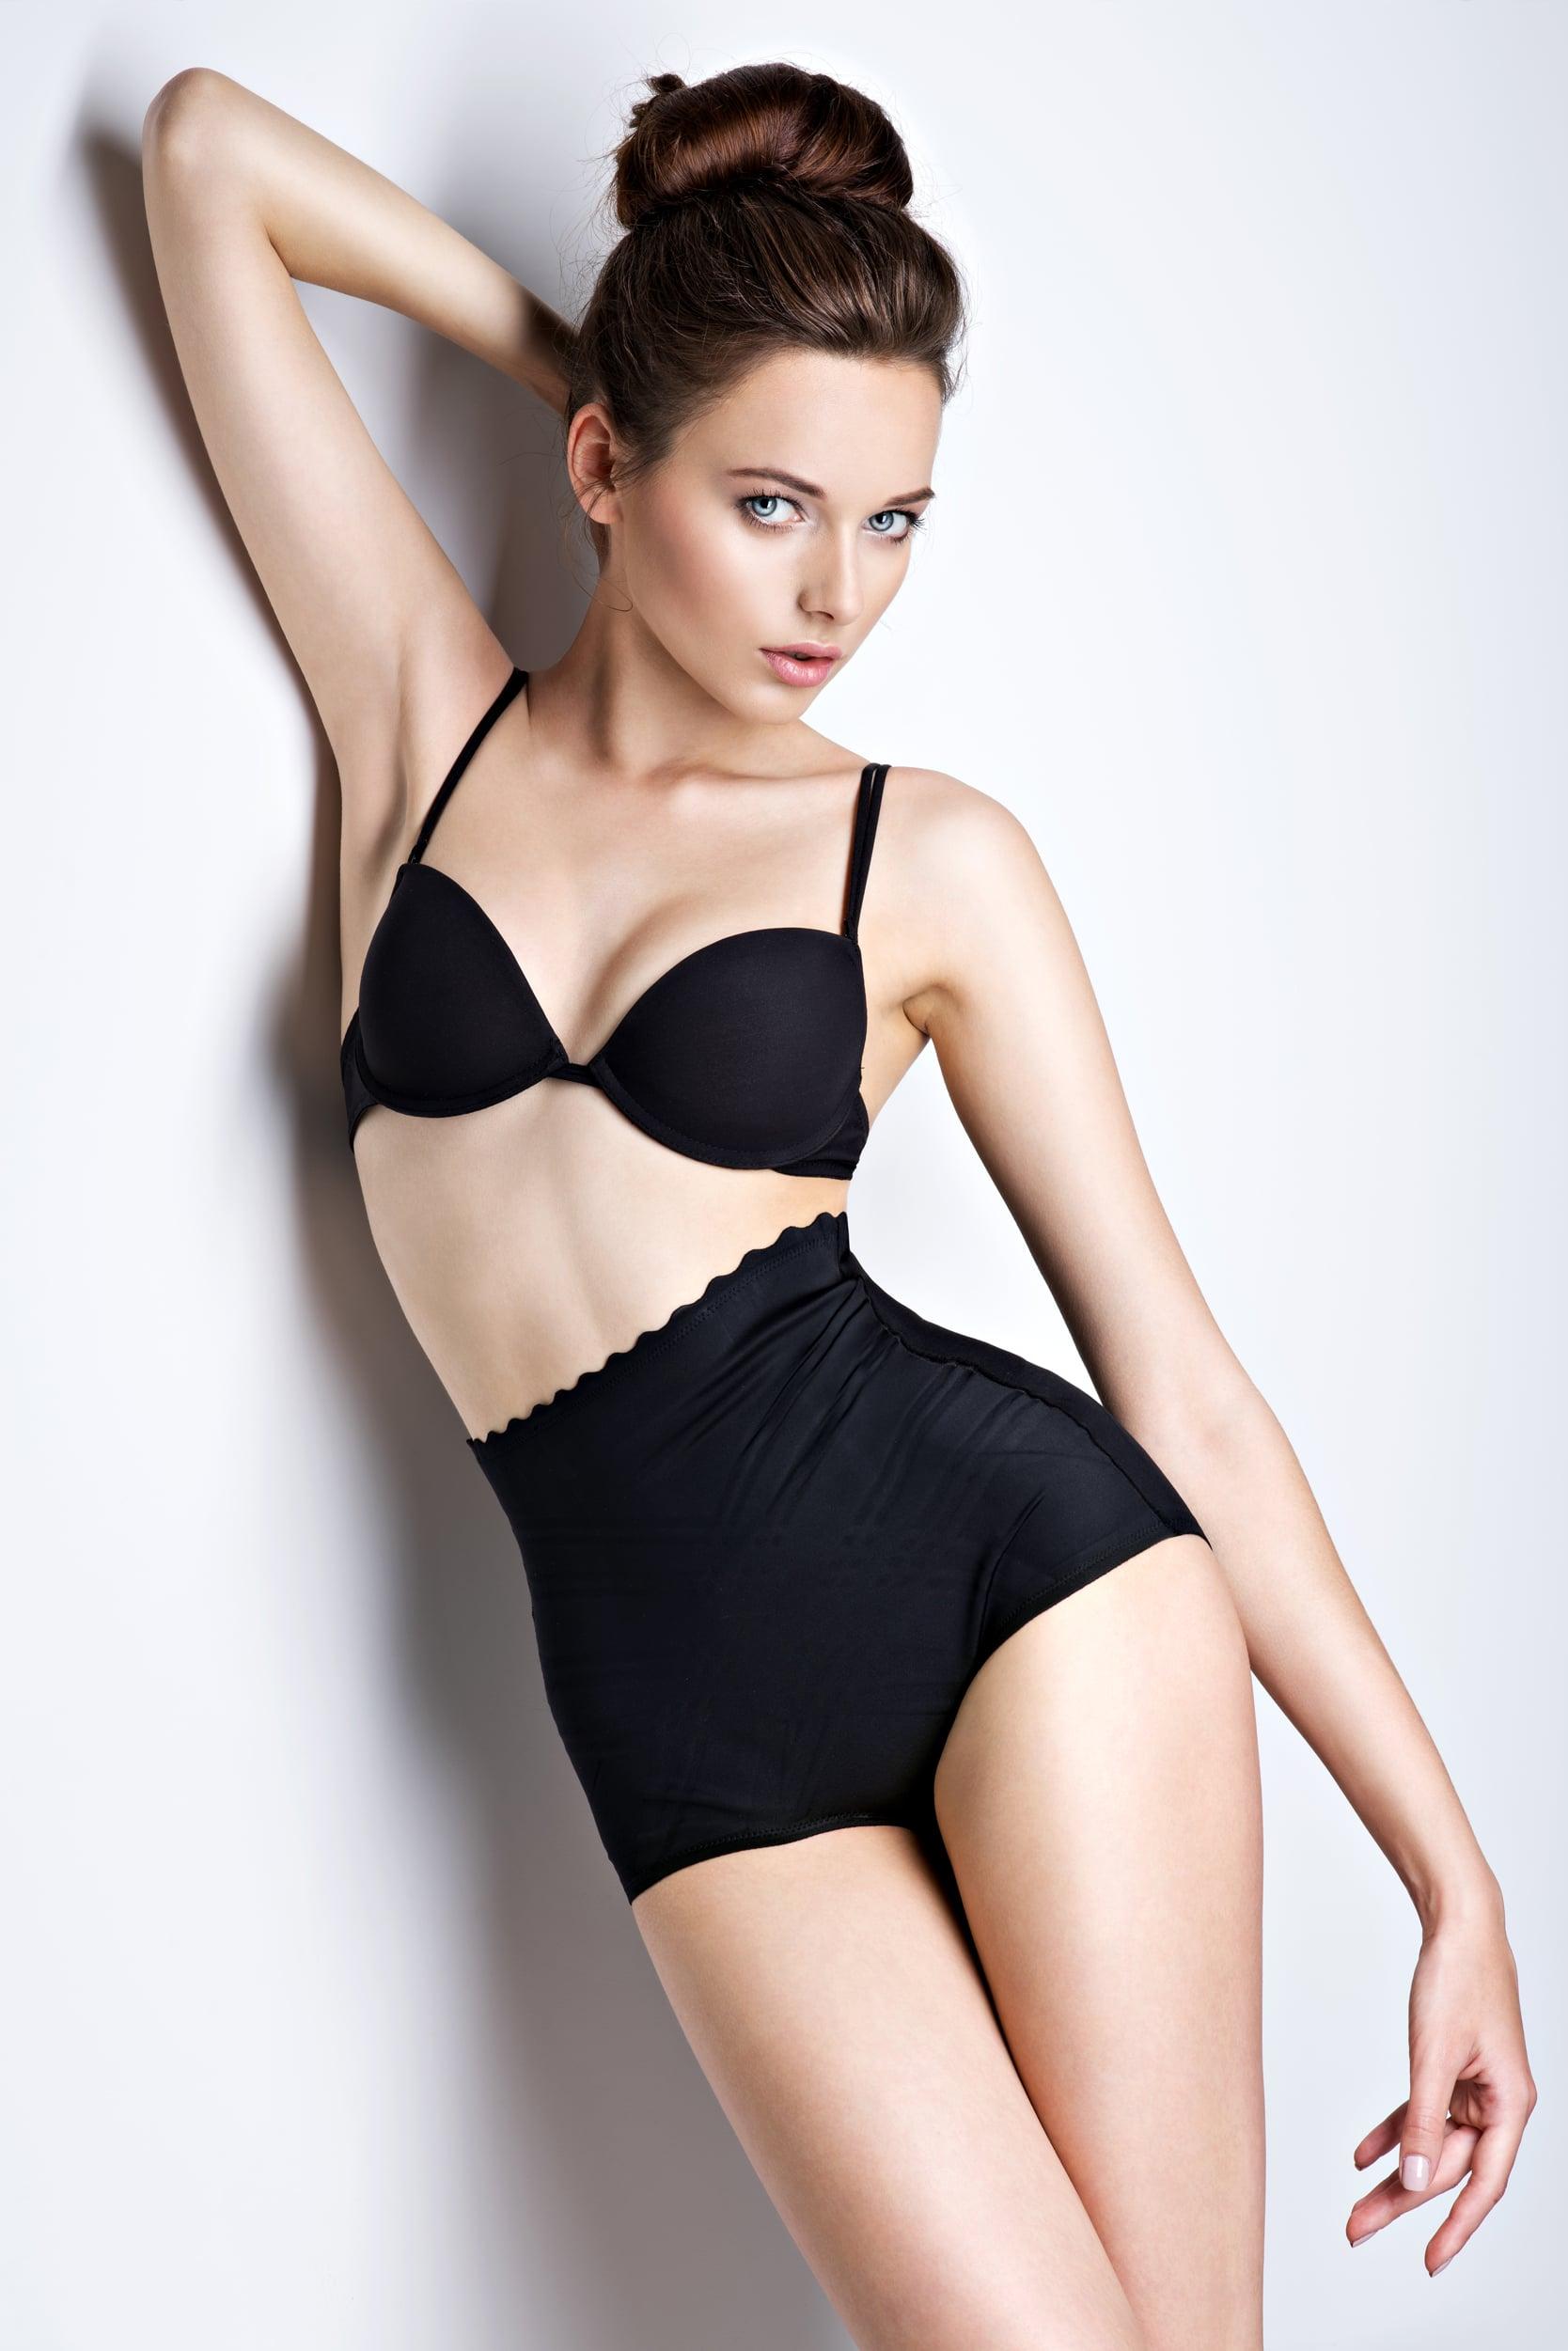 Sexy Model for Emsculpt Neo | Elite Plastic Surgery | Thigh Lift | Phoenix, AZ